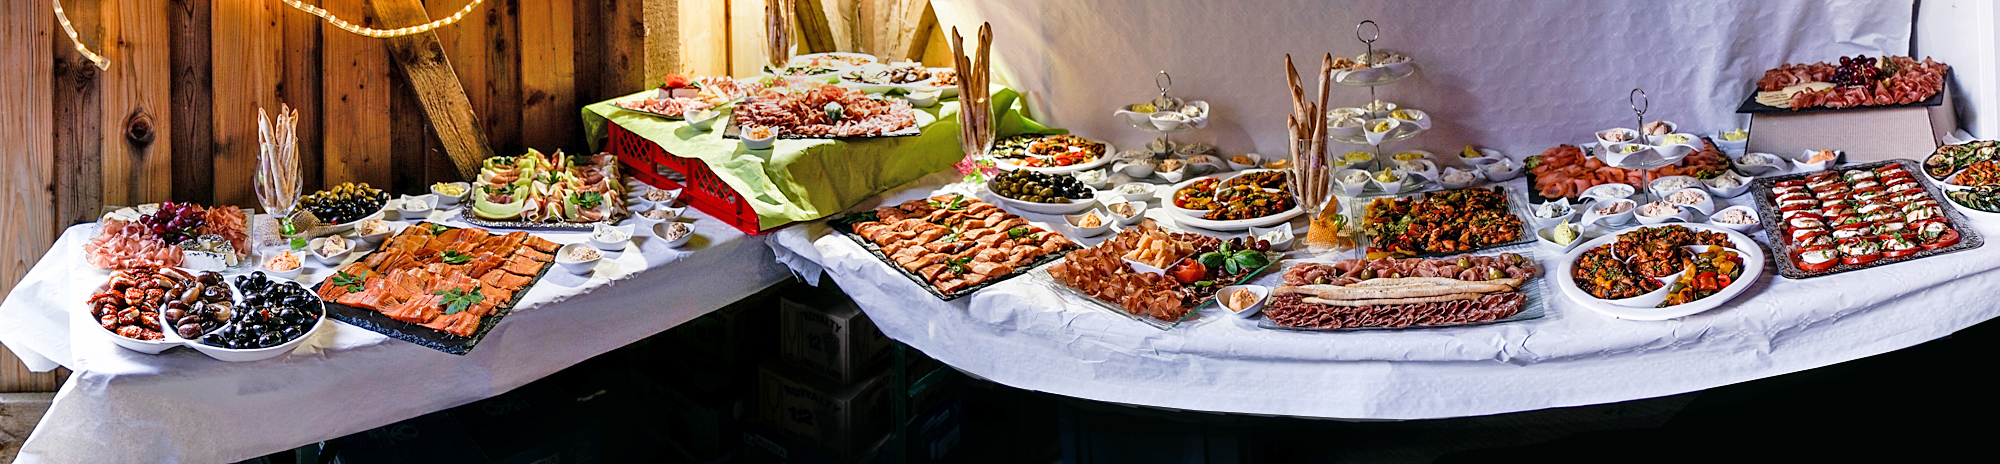 Geniesser Penzberg Catering Partyservice